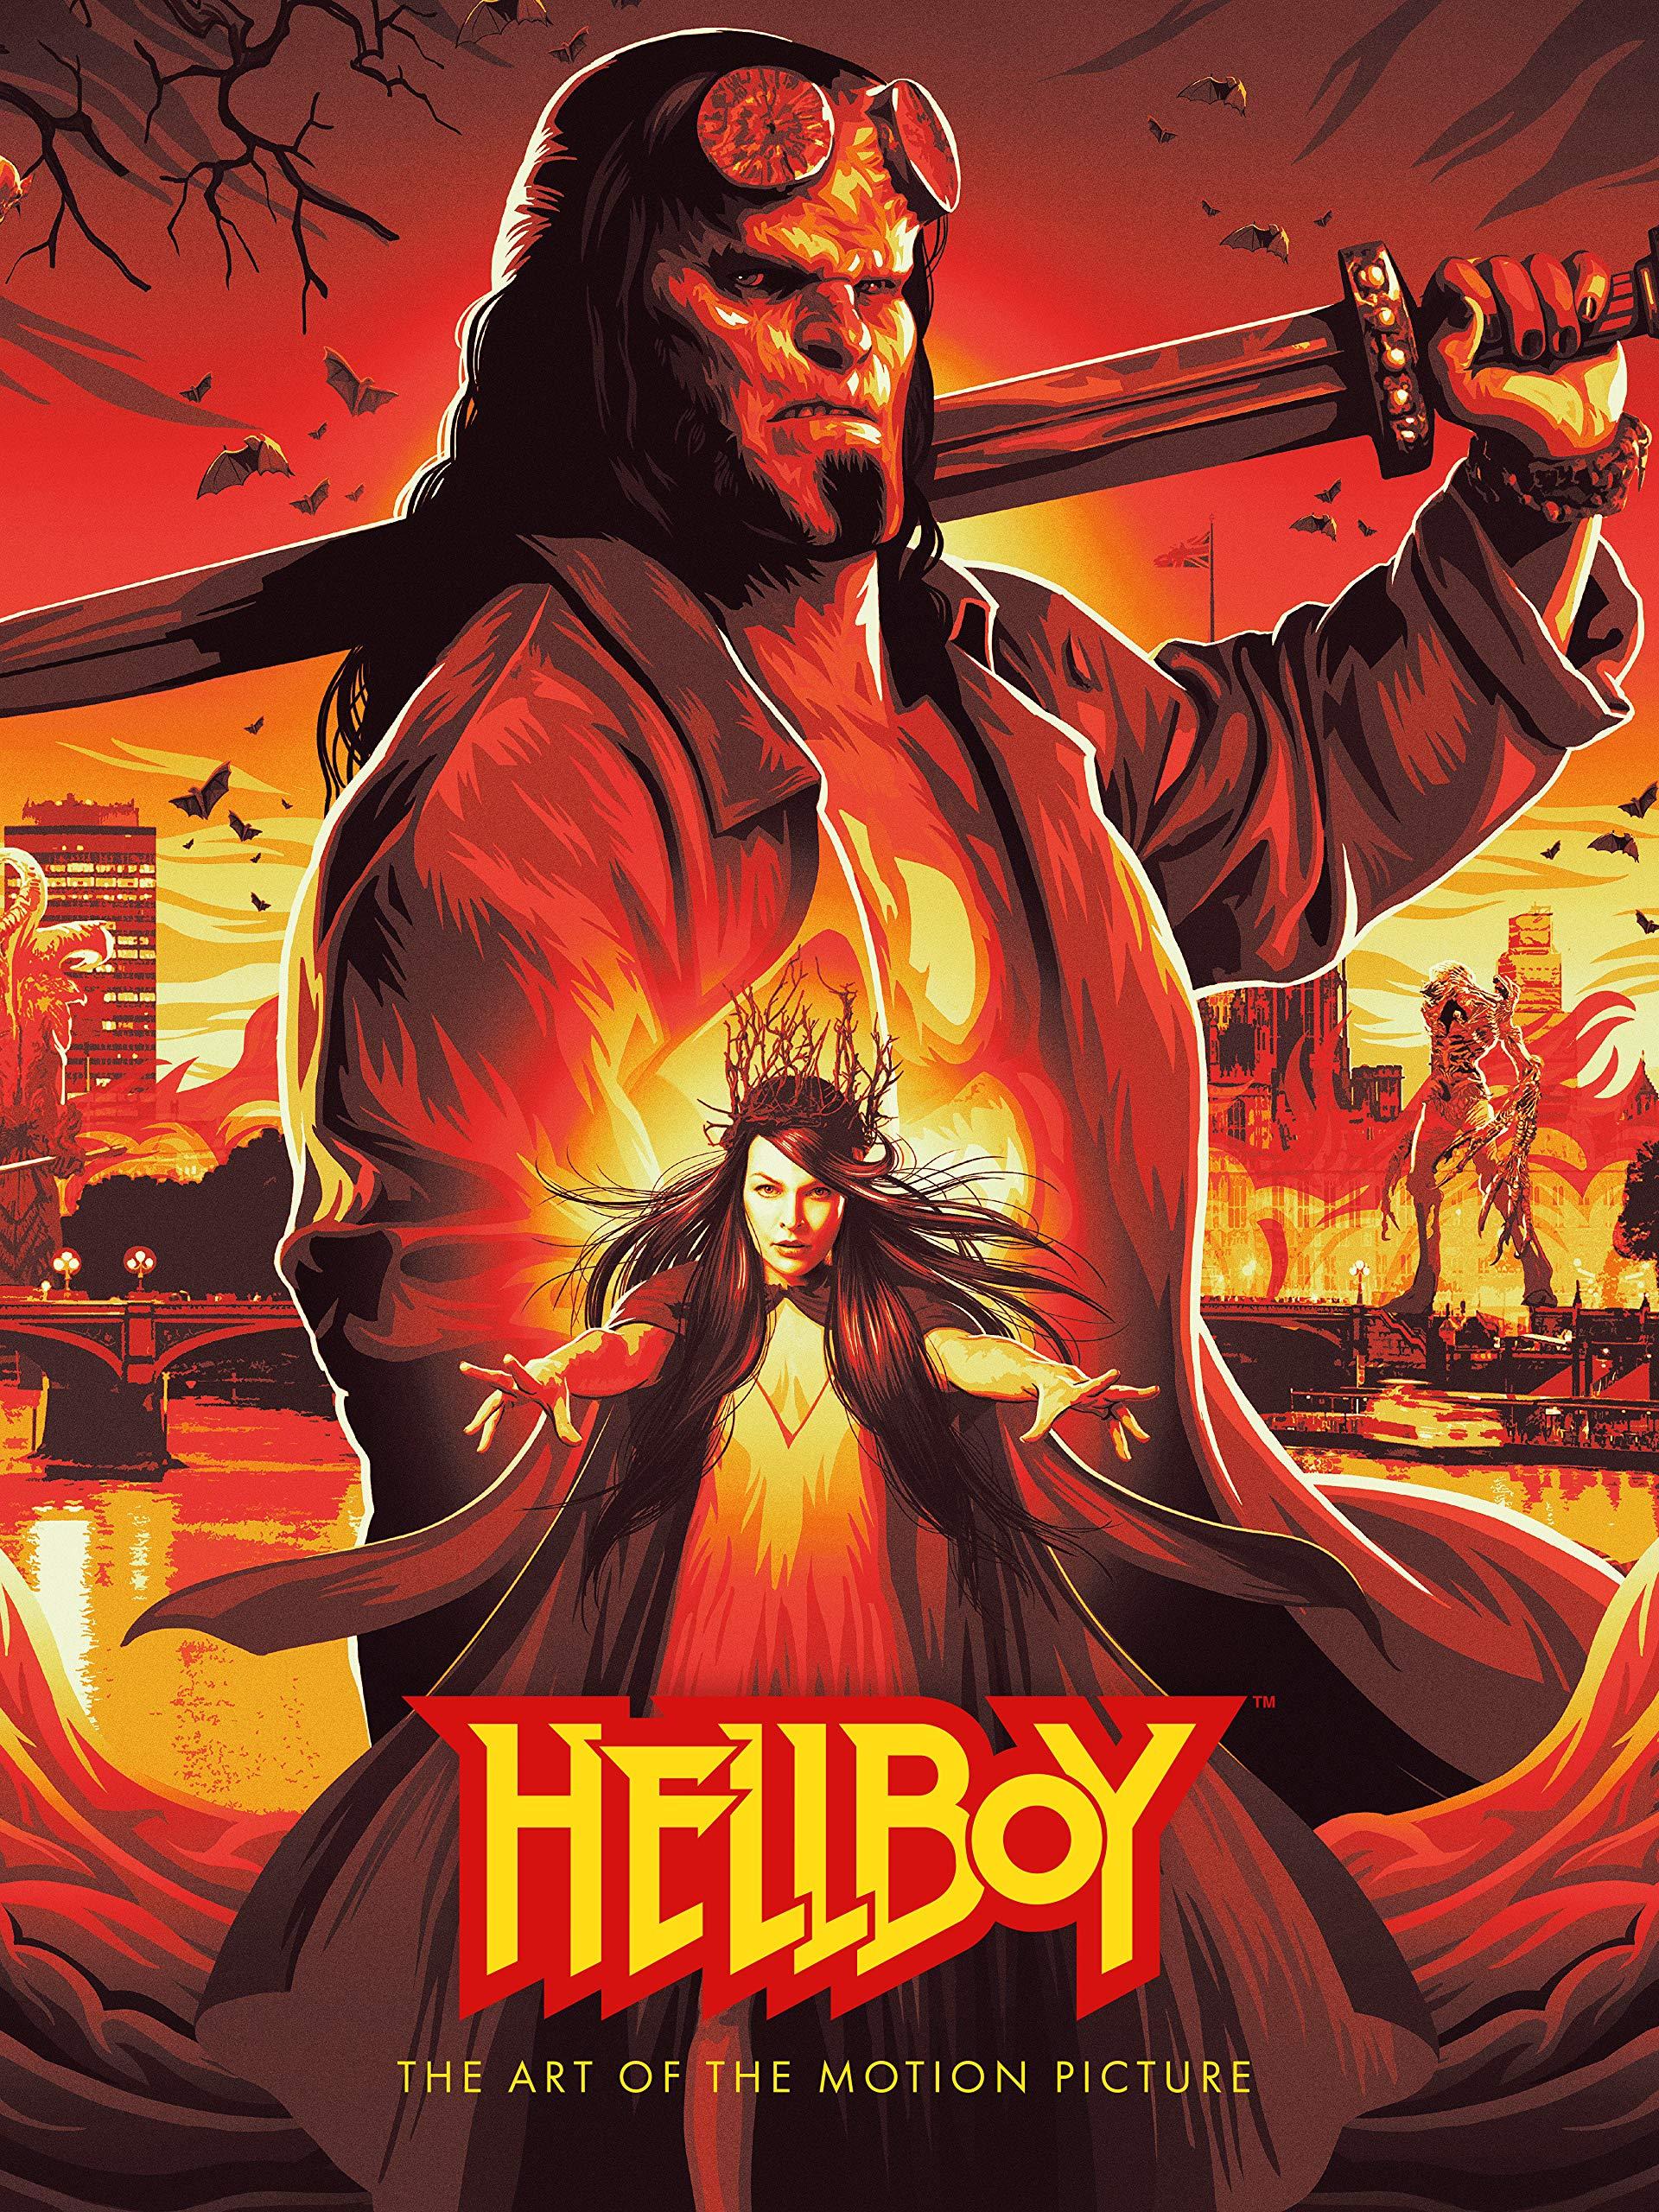 Hellboy The Art Of The Motion Picture 2019 Amazon De Various Fremdsprachige Bucher